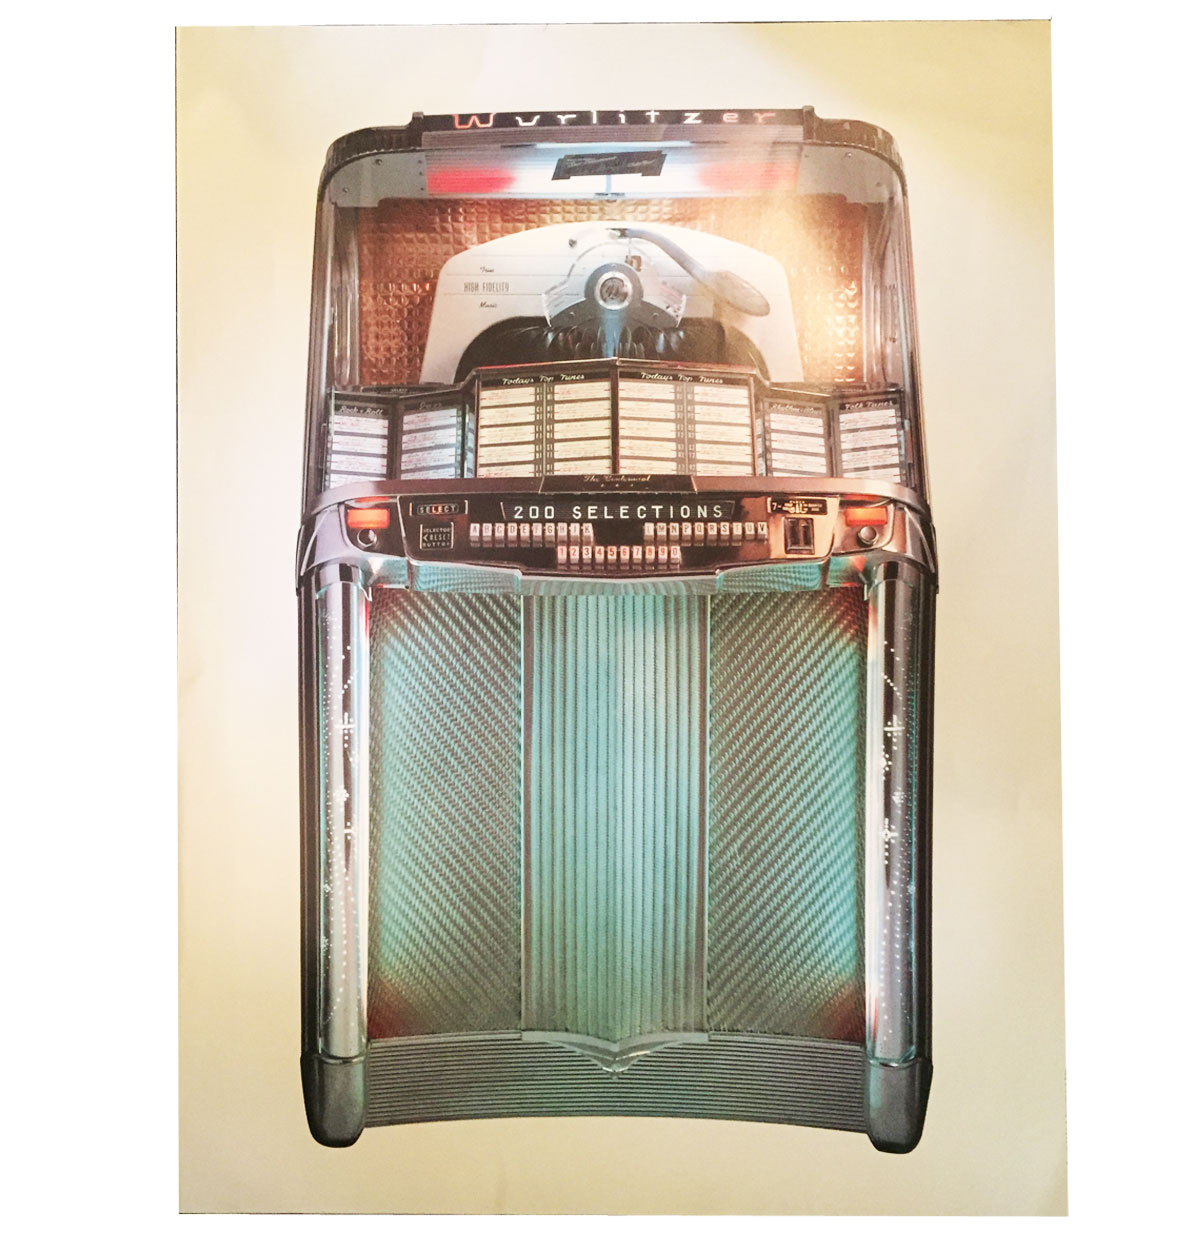 Wurlitzer 2000 jukebox poster